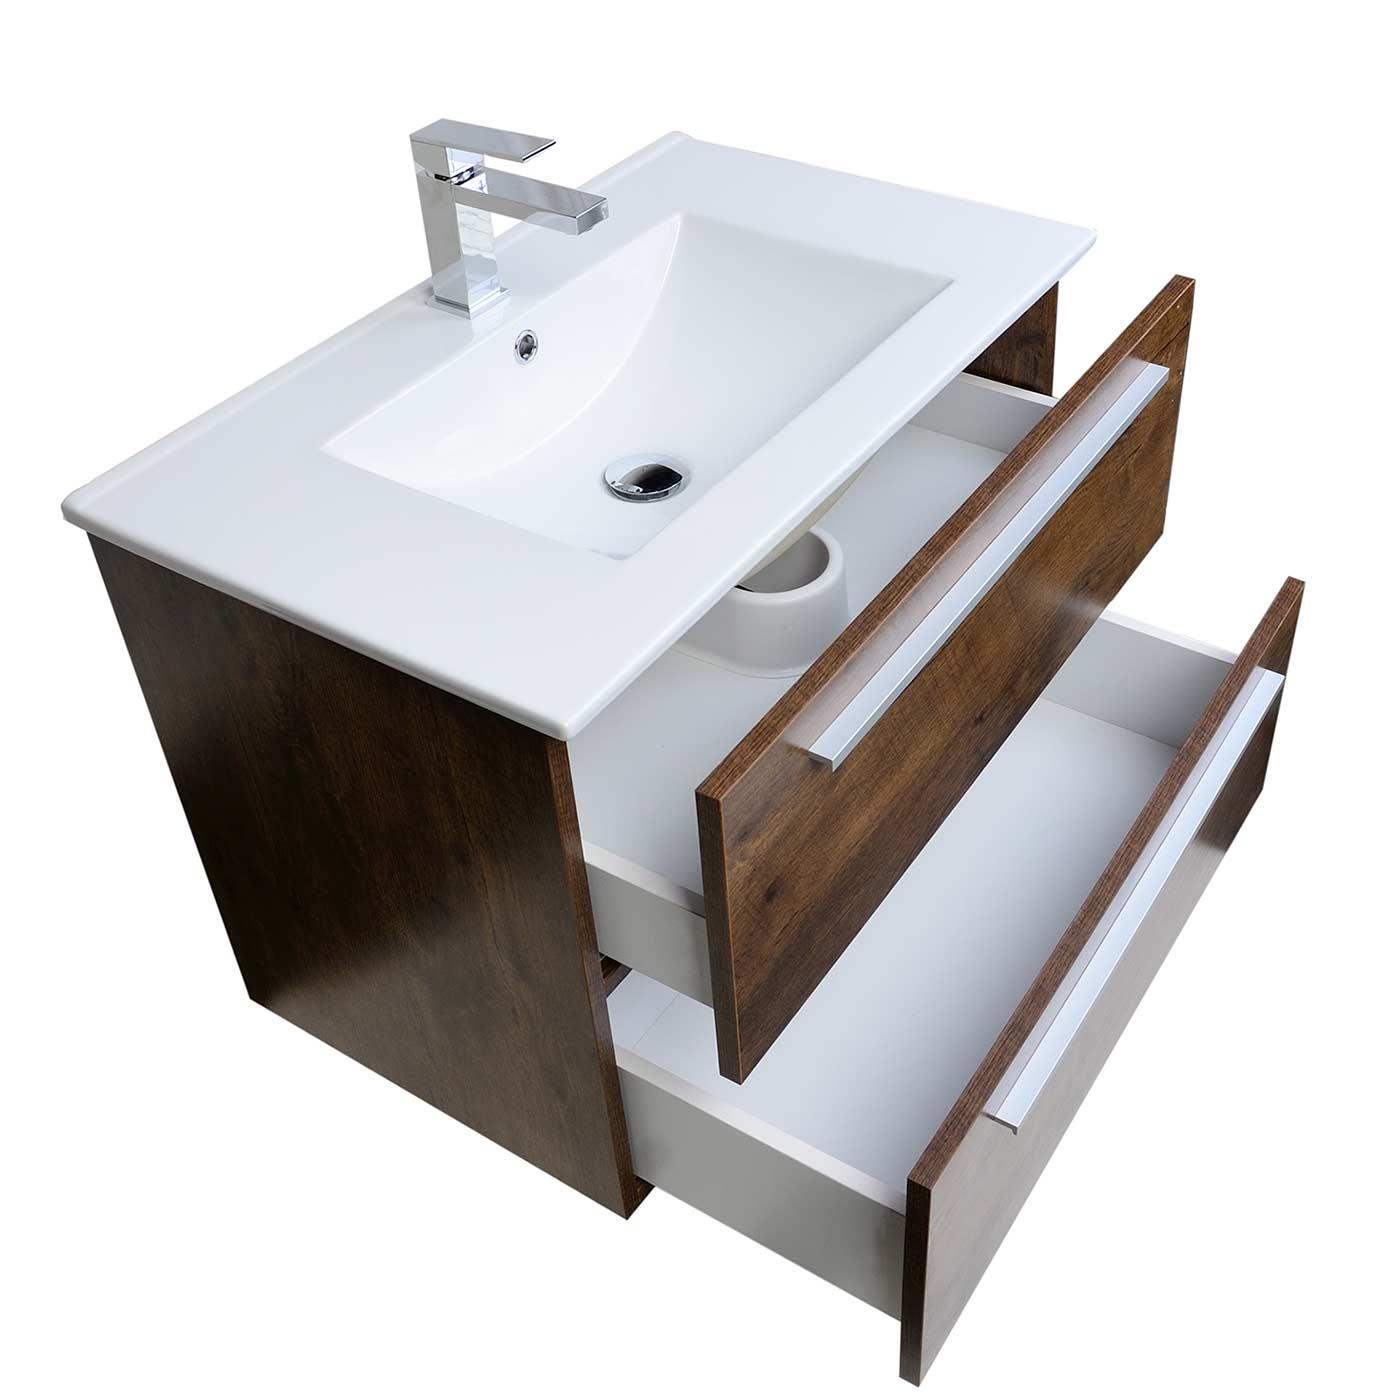 Modern Wall Mount Vanity.Nola 29 5 Wall Mount Modern Bathroom Vanity Rose Wood Tn T750c Rw